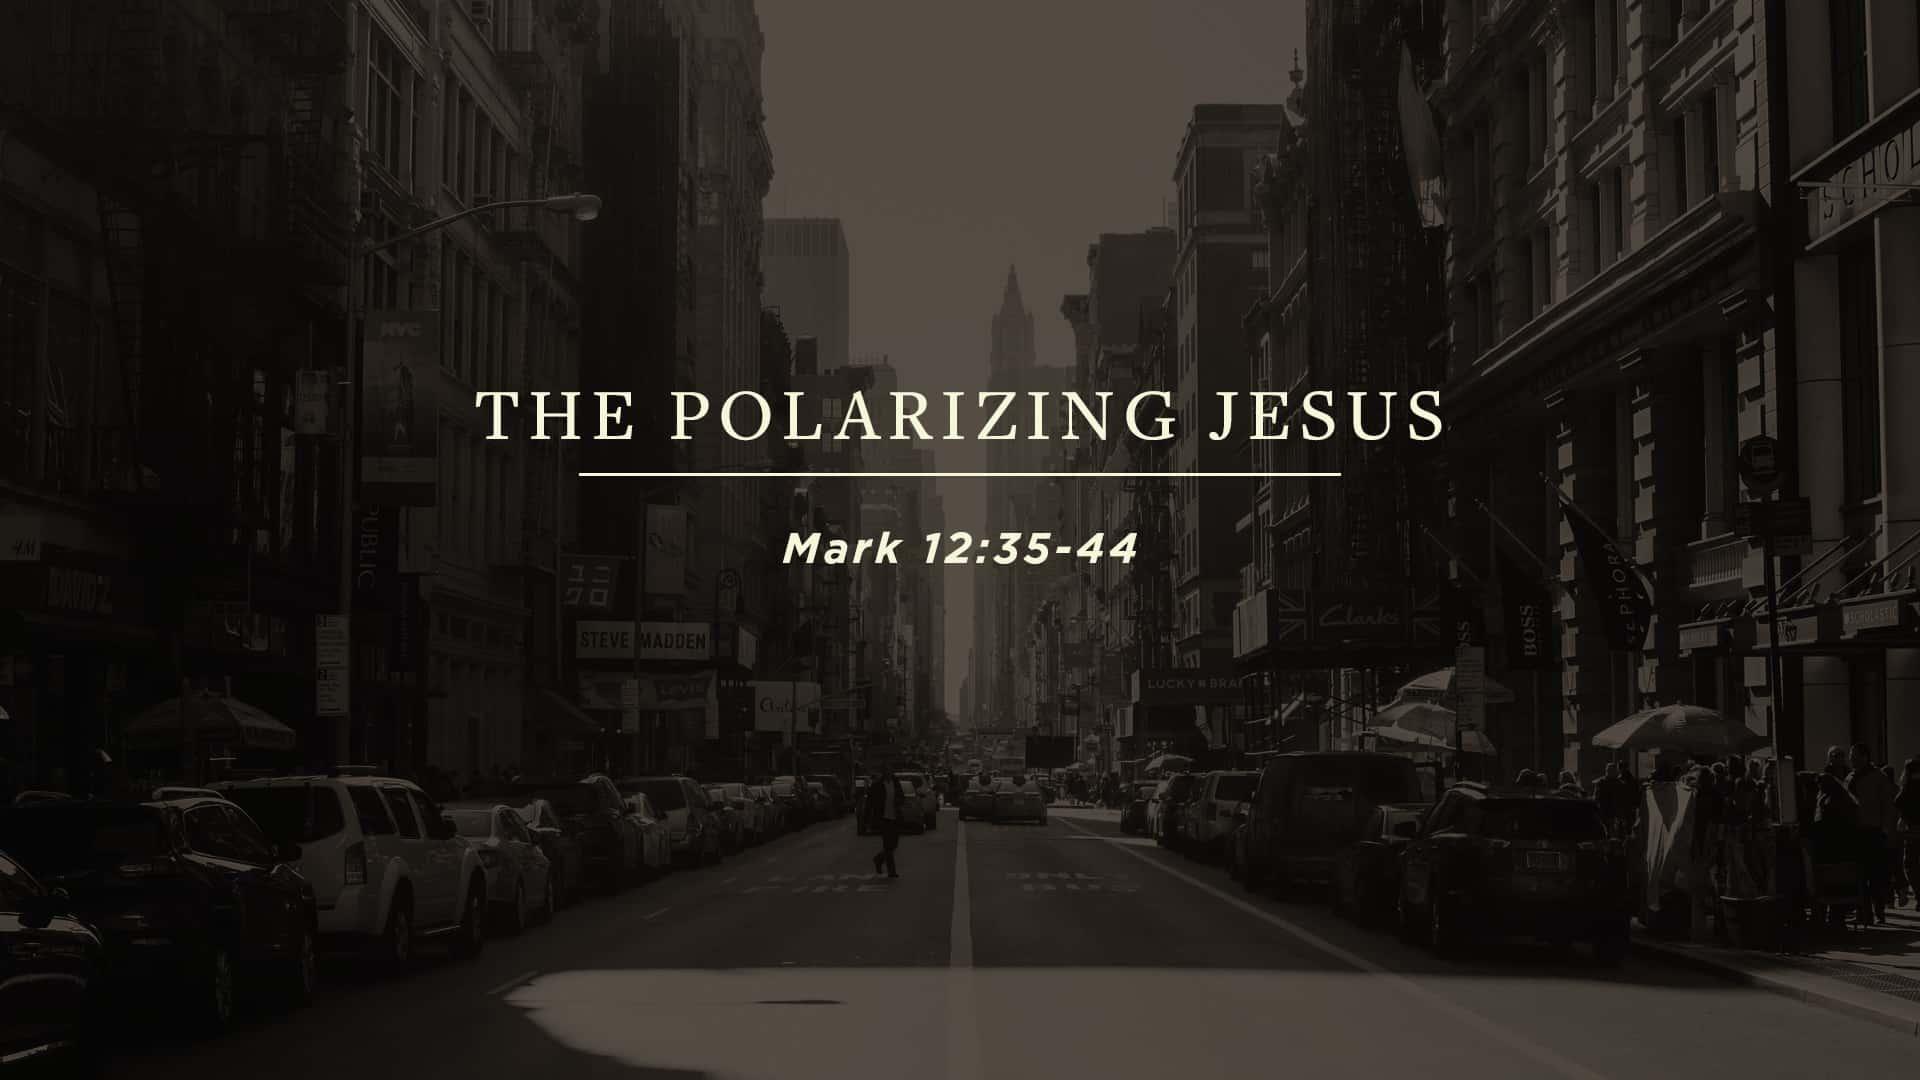 The Polarizing Jesus